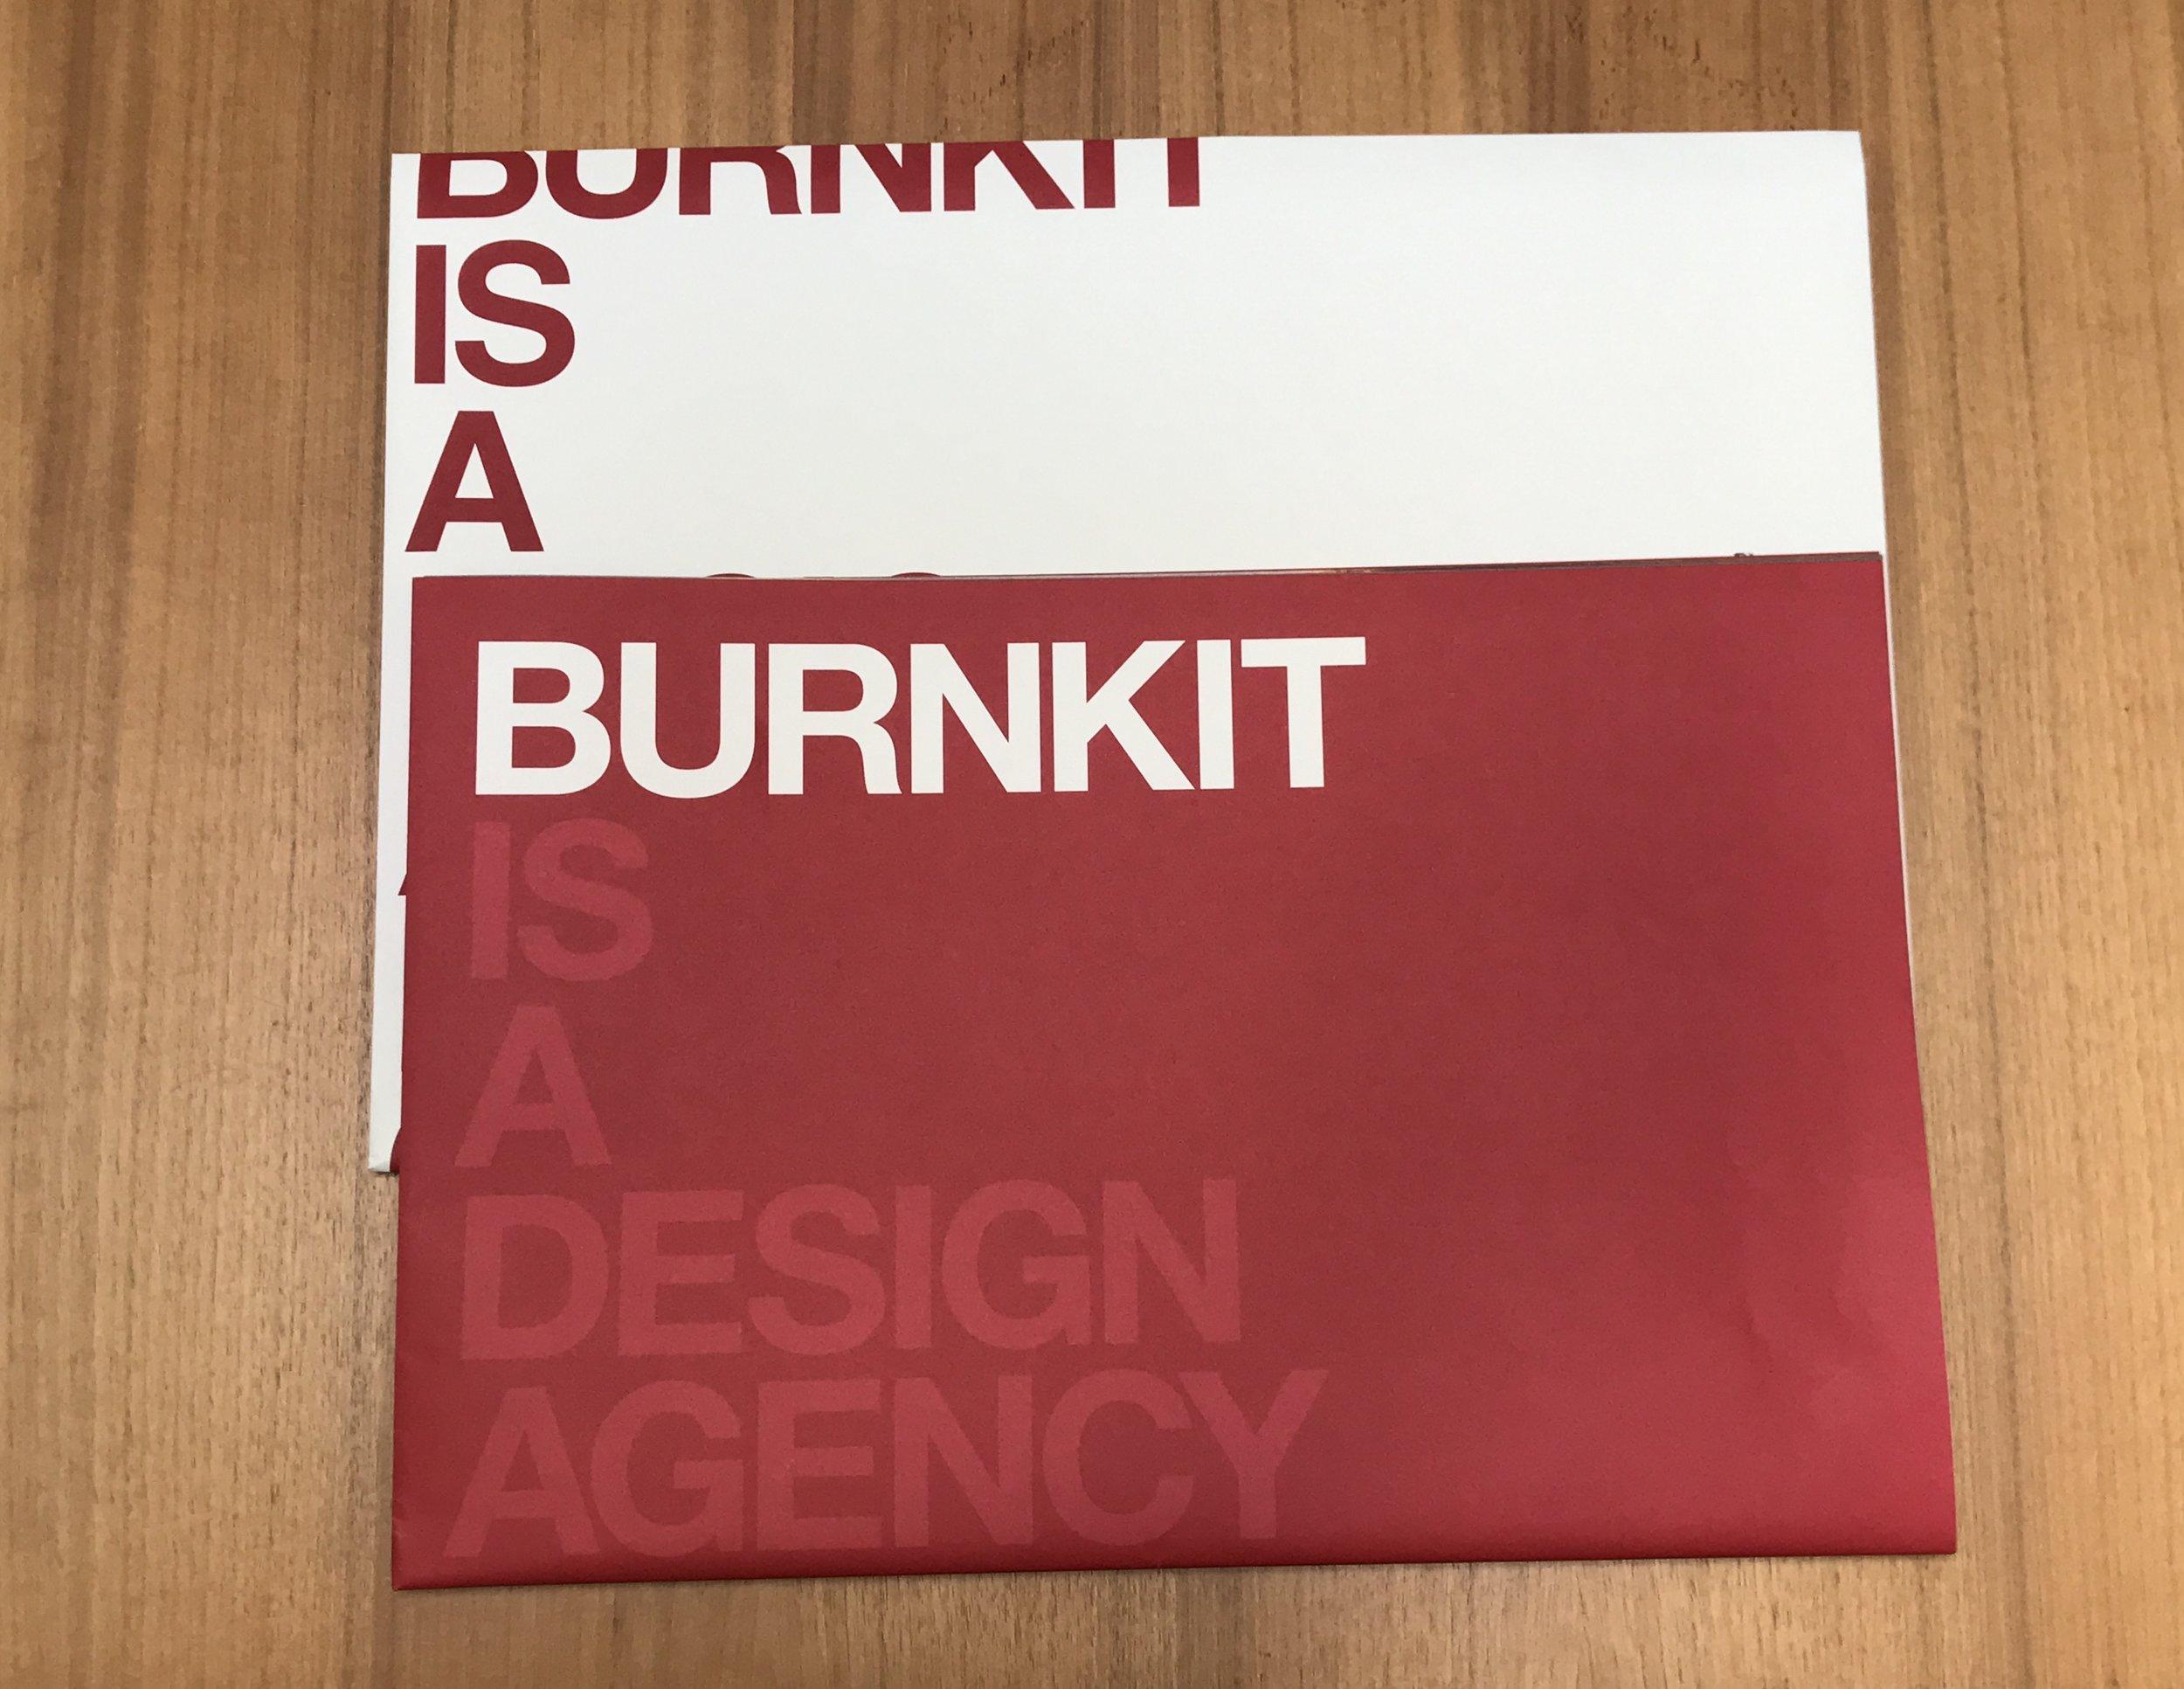 Burnkit is…